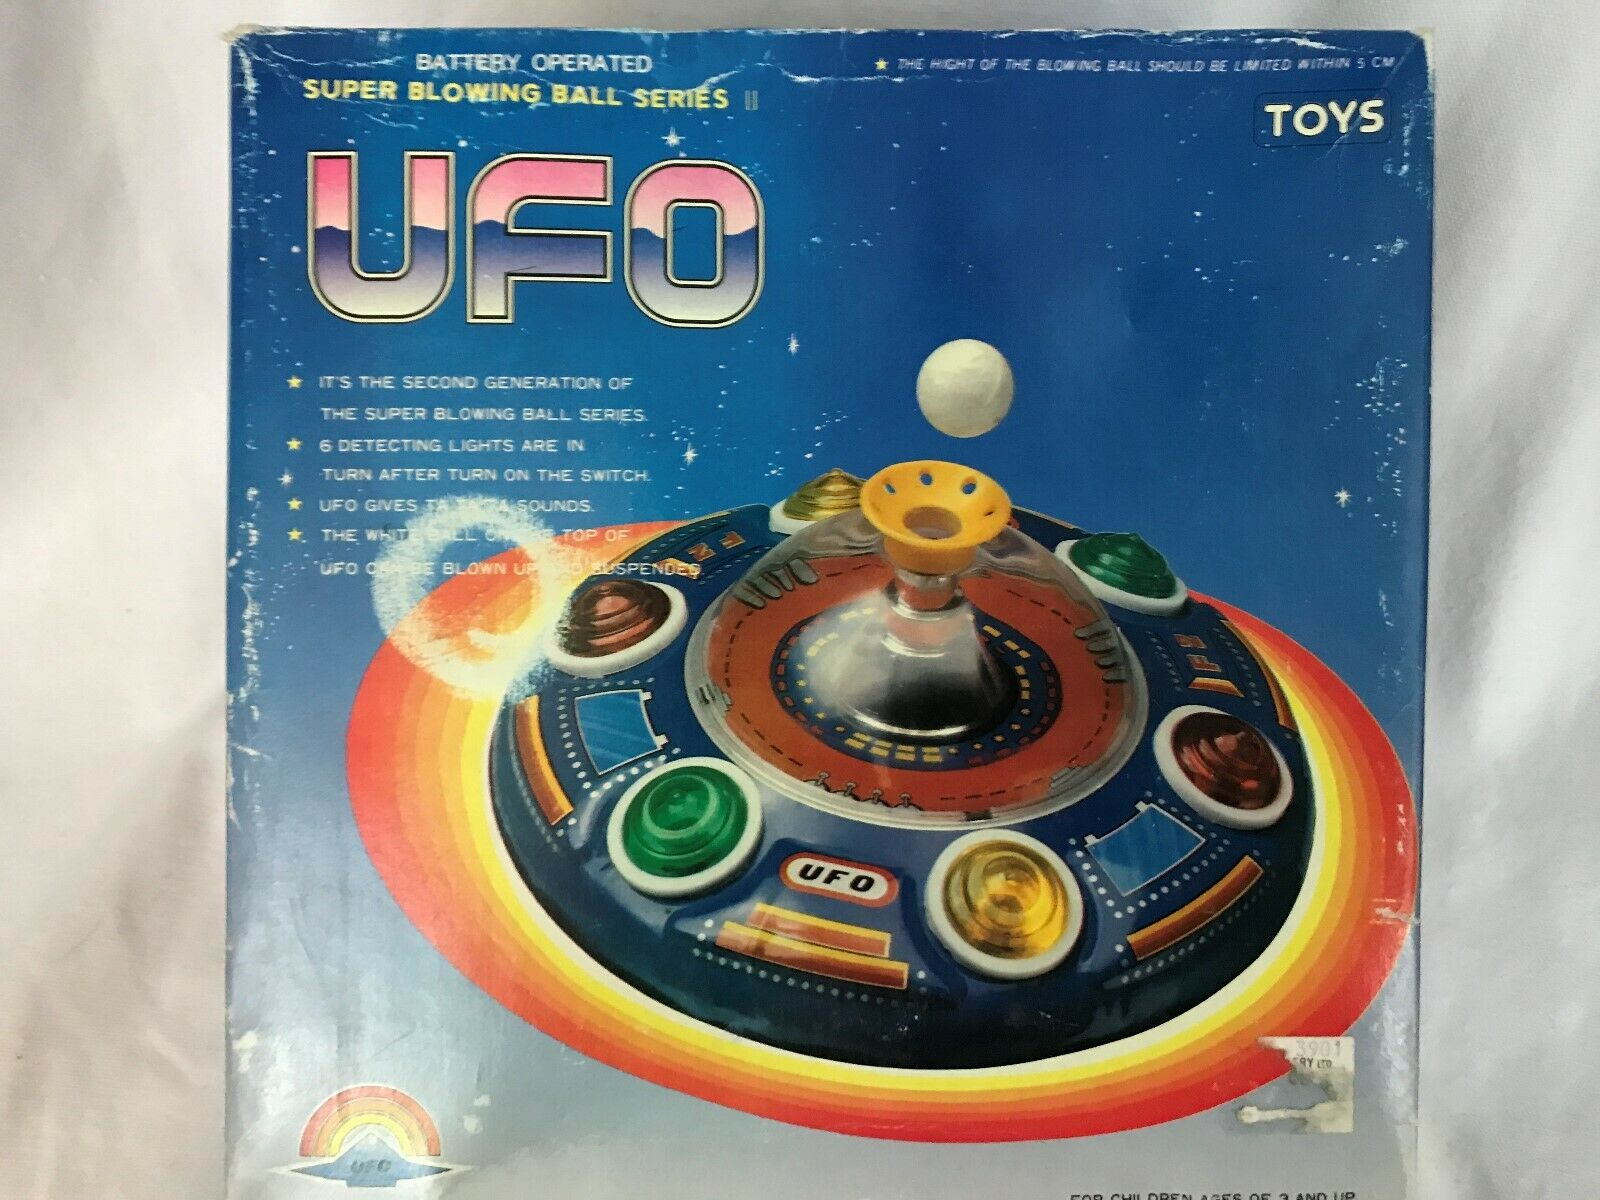 Super Blovinge boll serie II UFO Battery Op ljus Up Suspended boll Mechanical